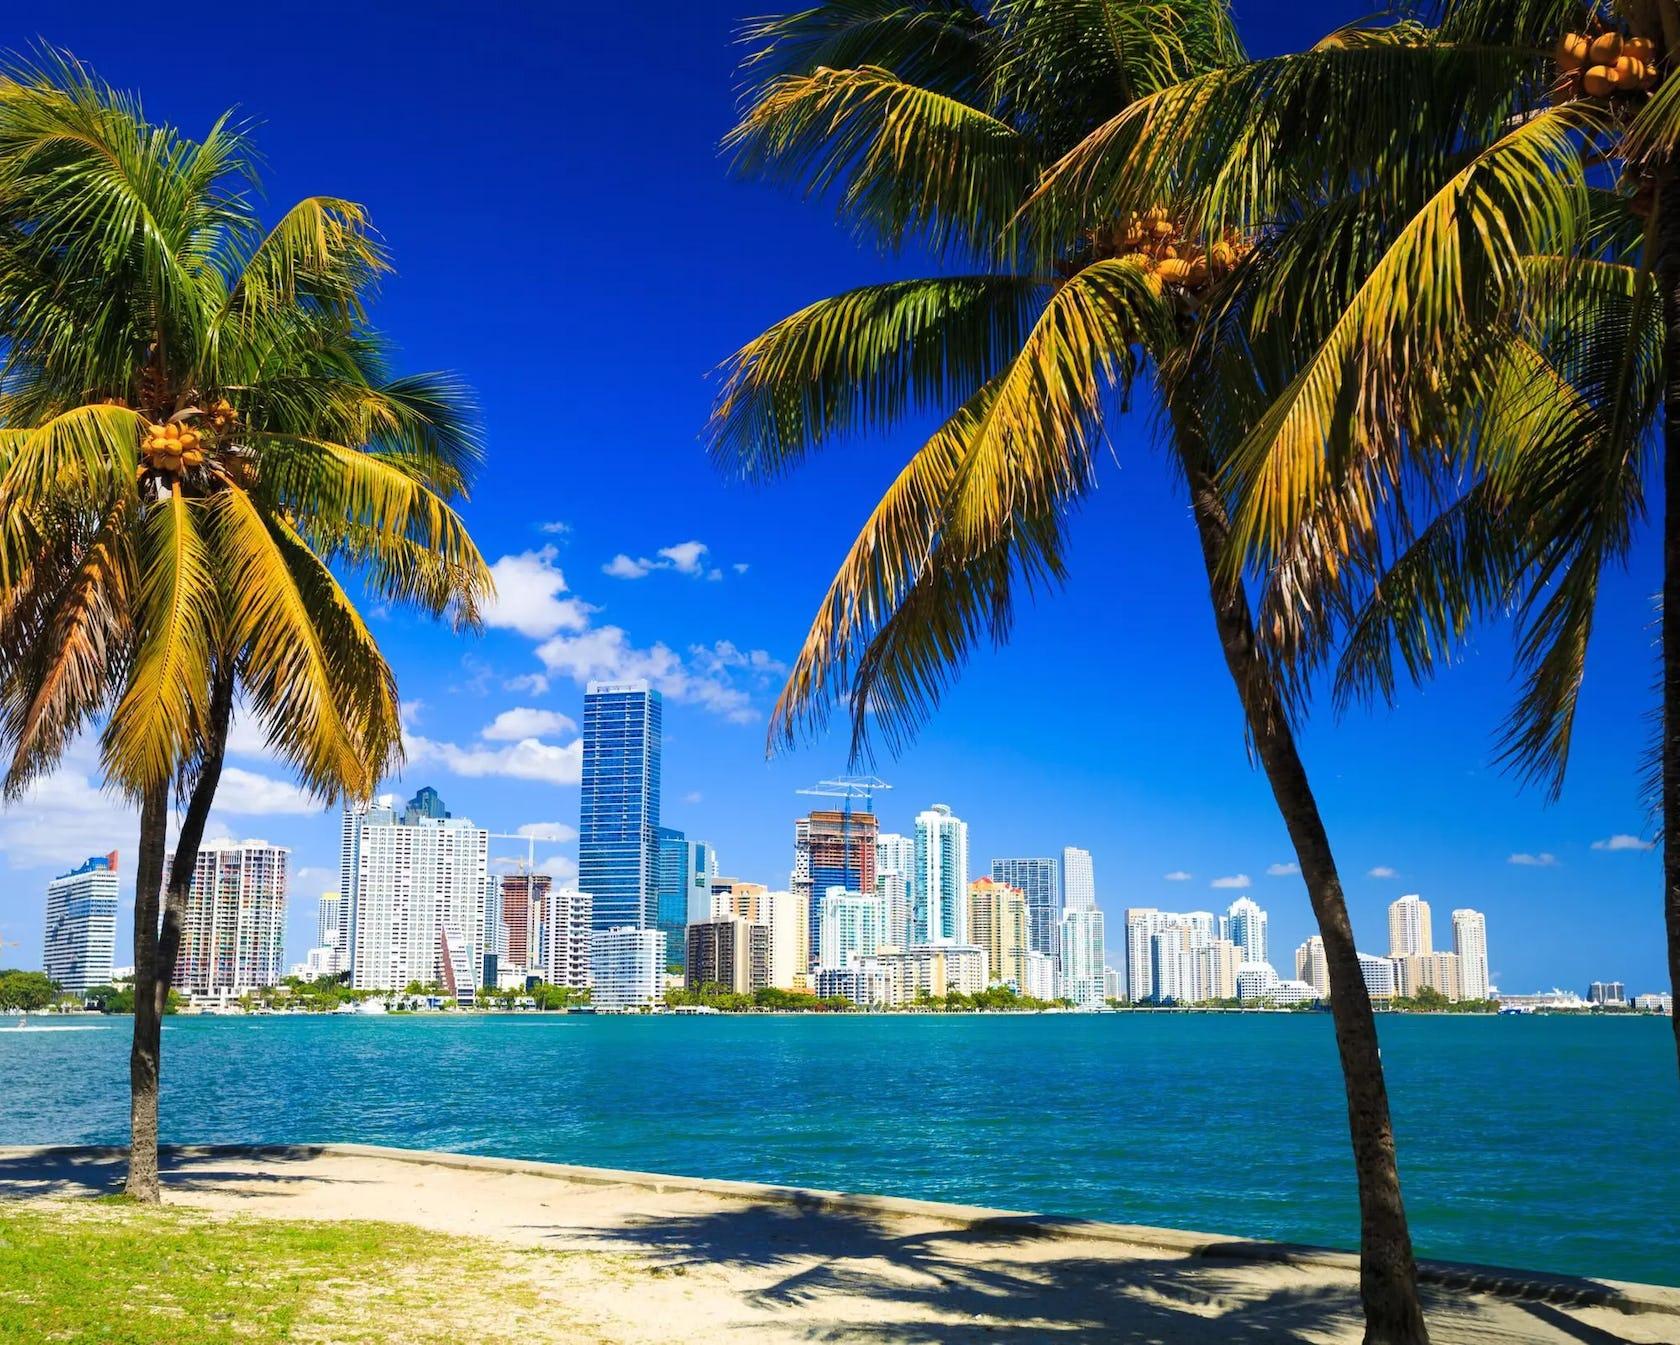 Where to invest in luxury real estate around Miami?